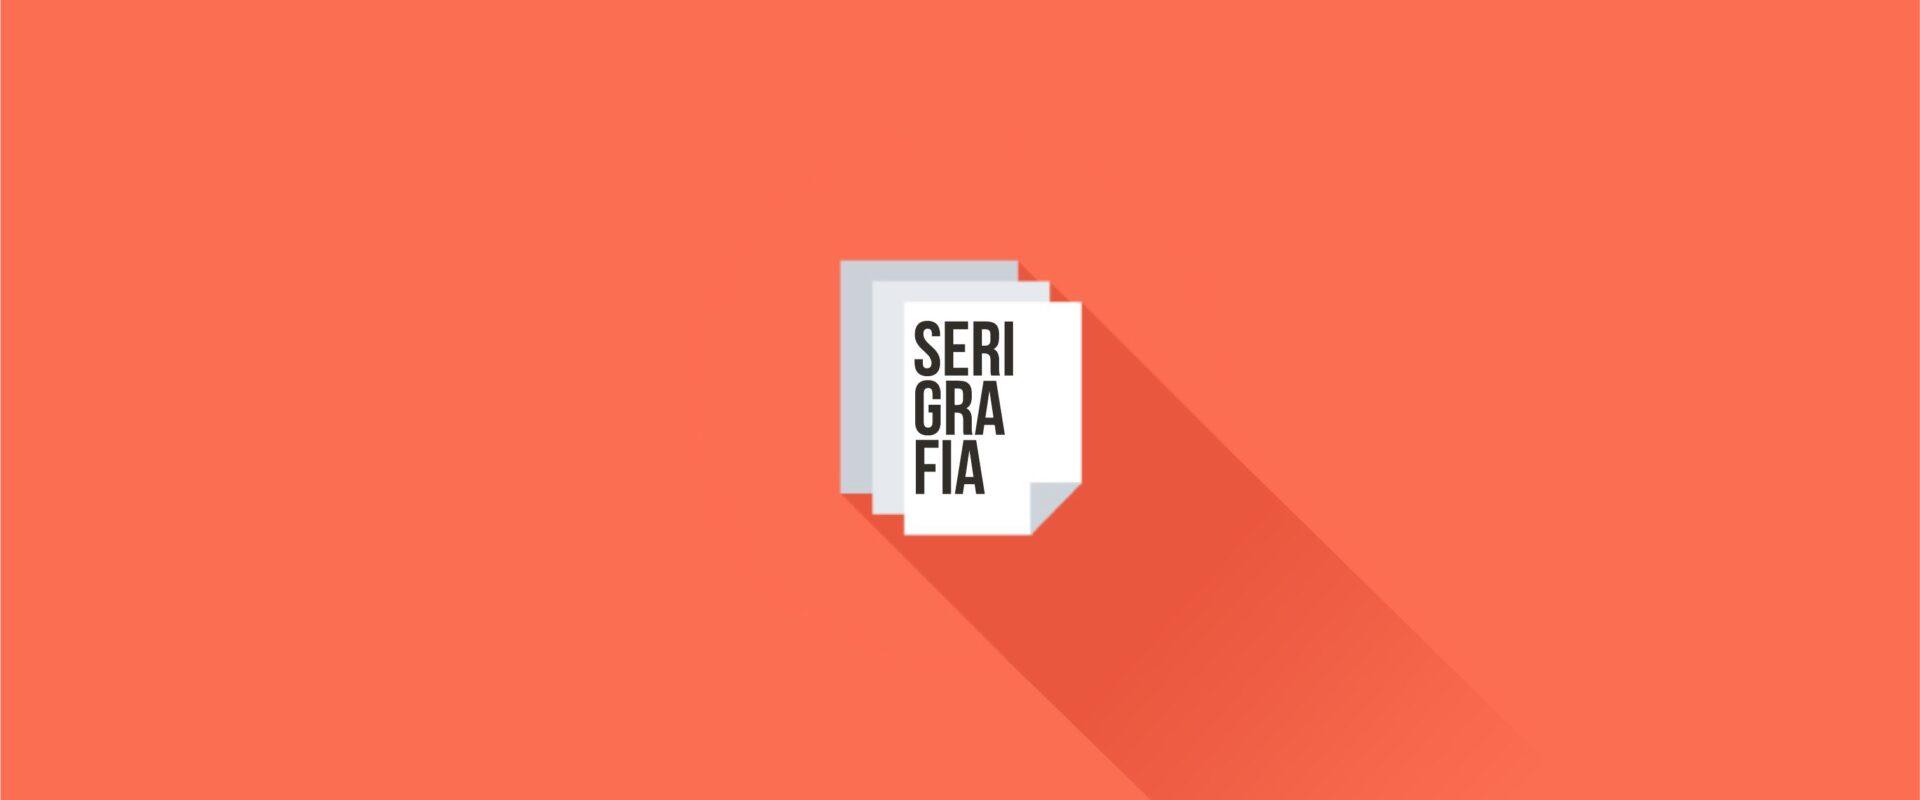 DIEMA STAMPA: SERIGRAFIA Roma Sud